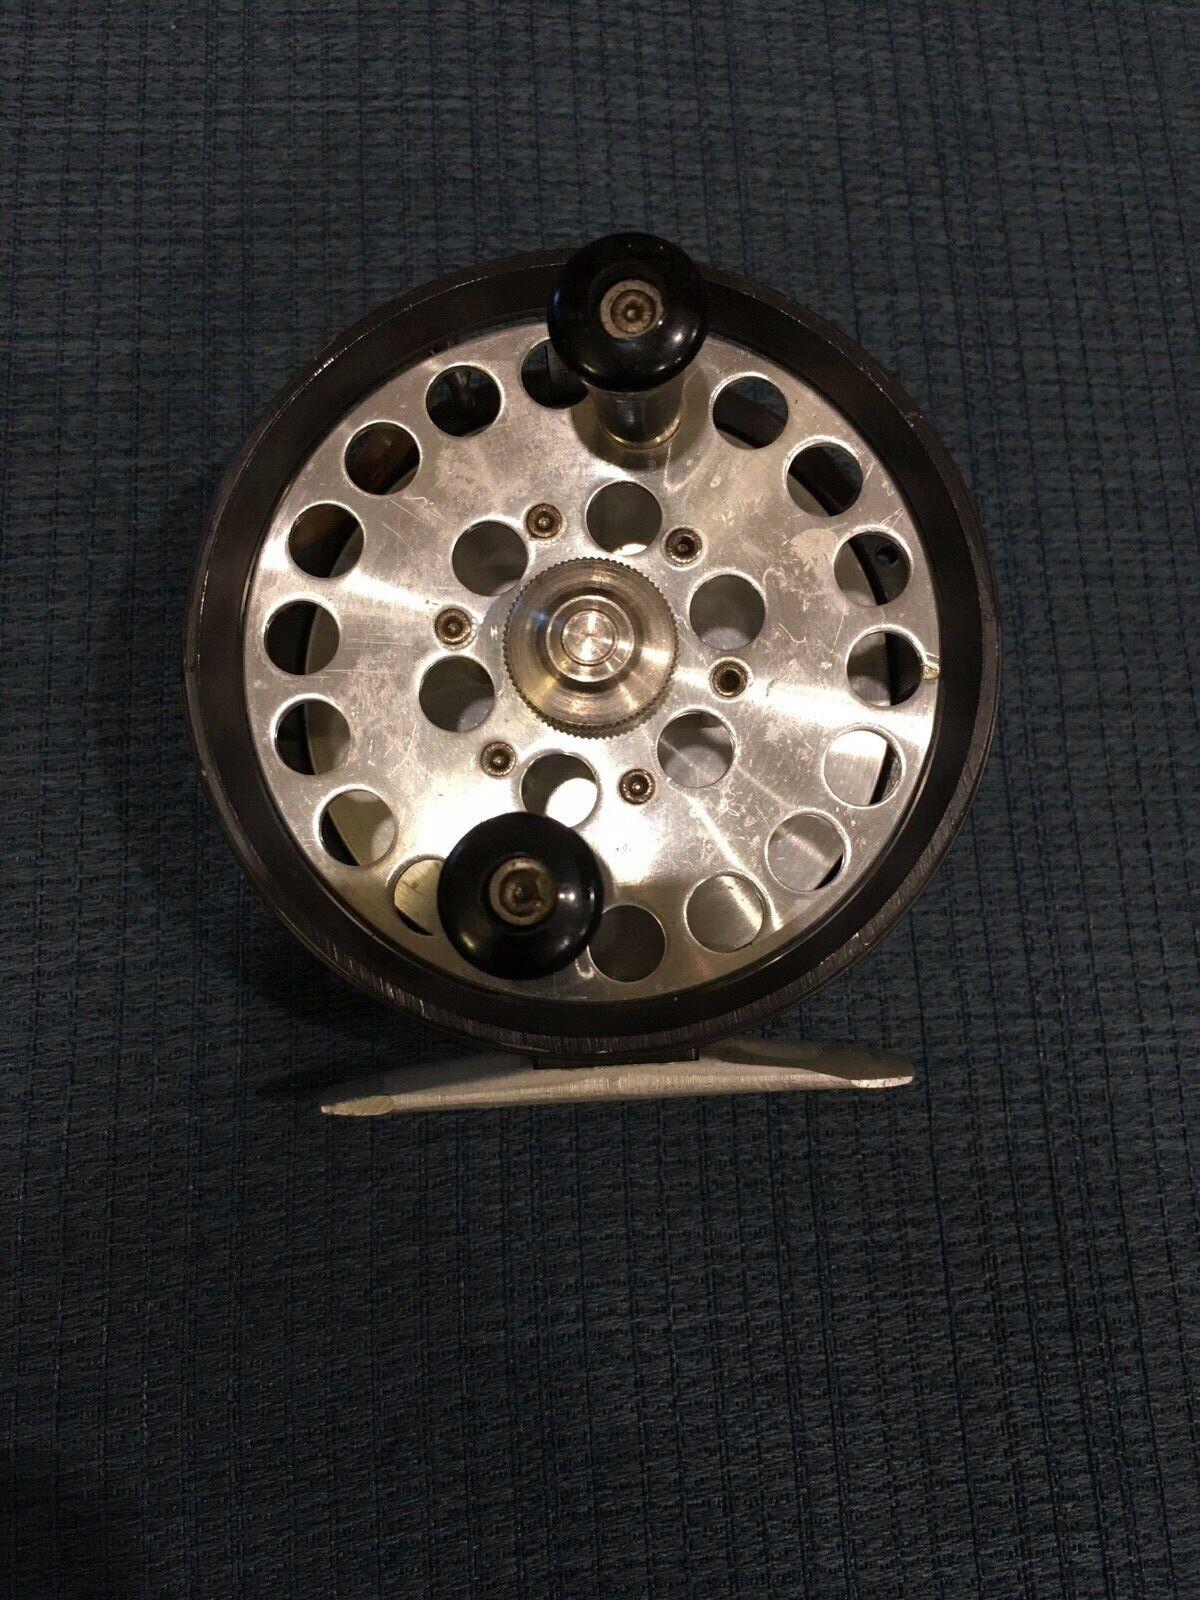 Vintage Herter's 3-3 8  Diameter Fly Reel made in USA